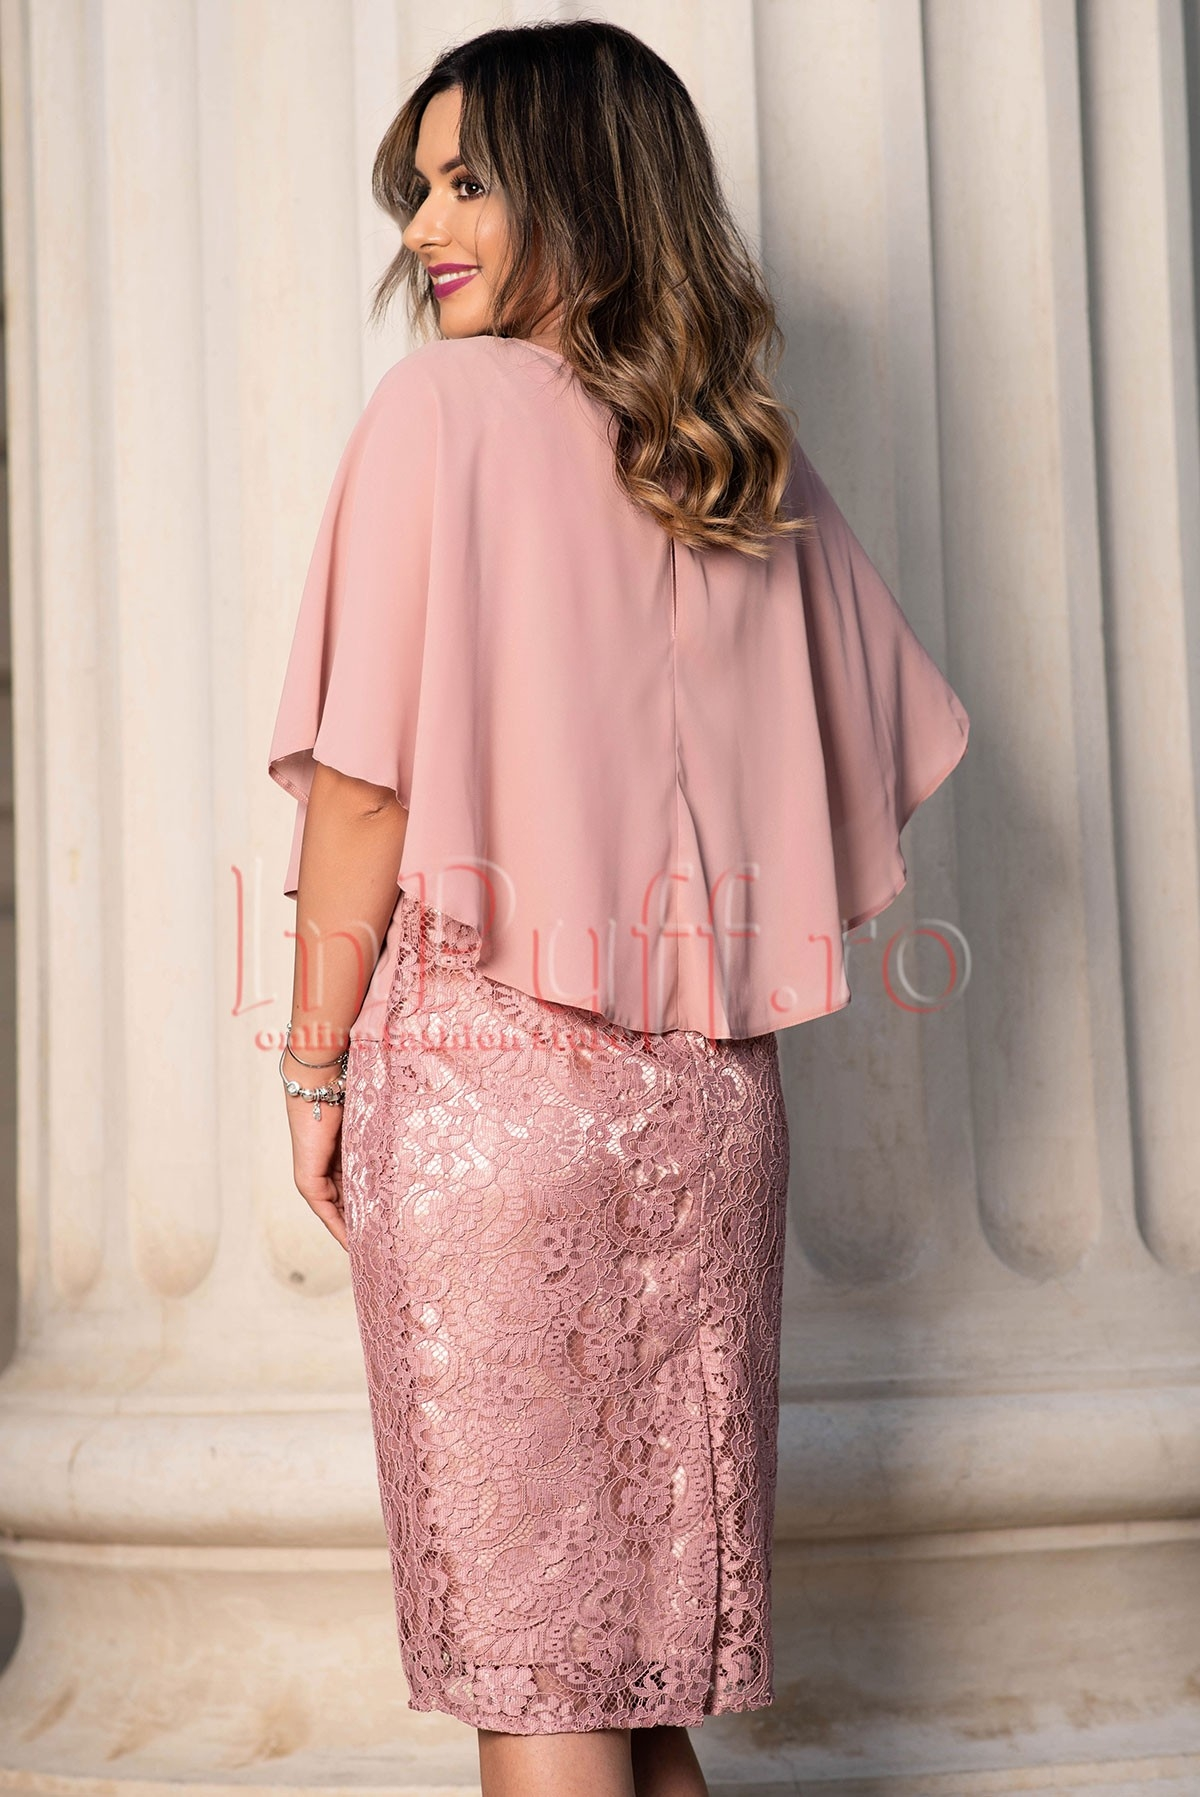 Rochie de ocazie roz prafuit din broderie si voal